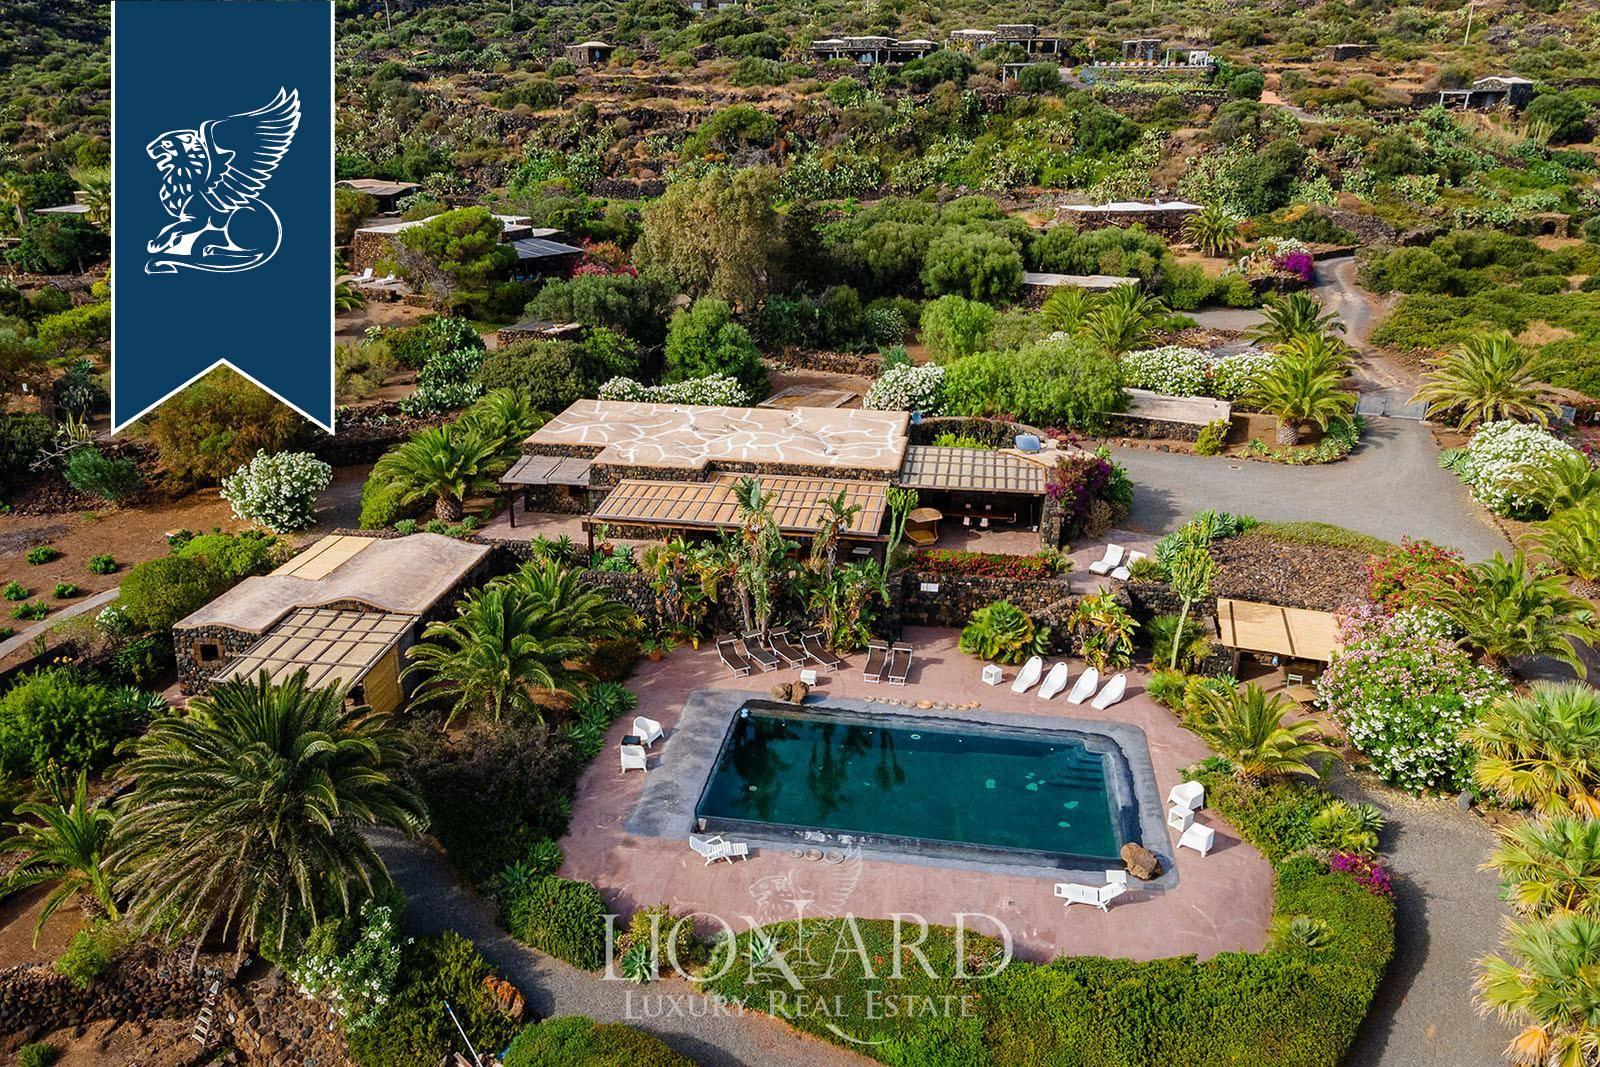 Albergo in Vendita a Pantelleria: 0 locali, 200 mq - Foto 5